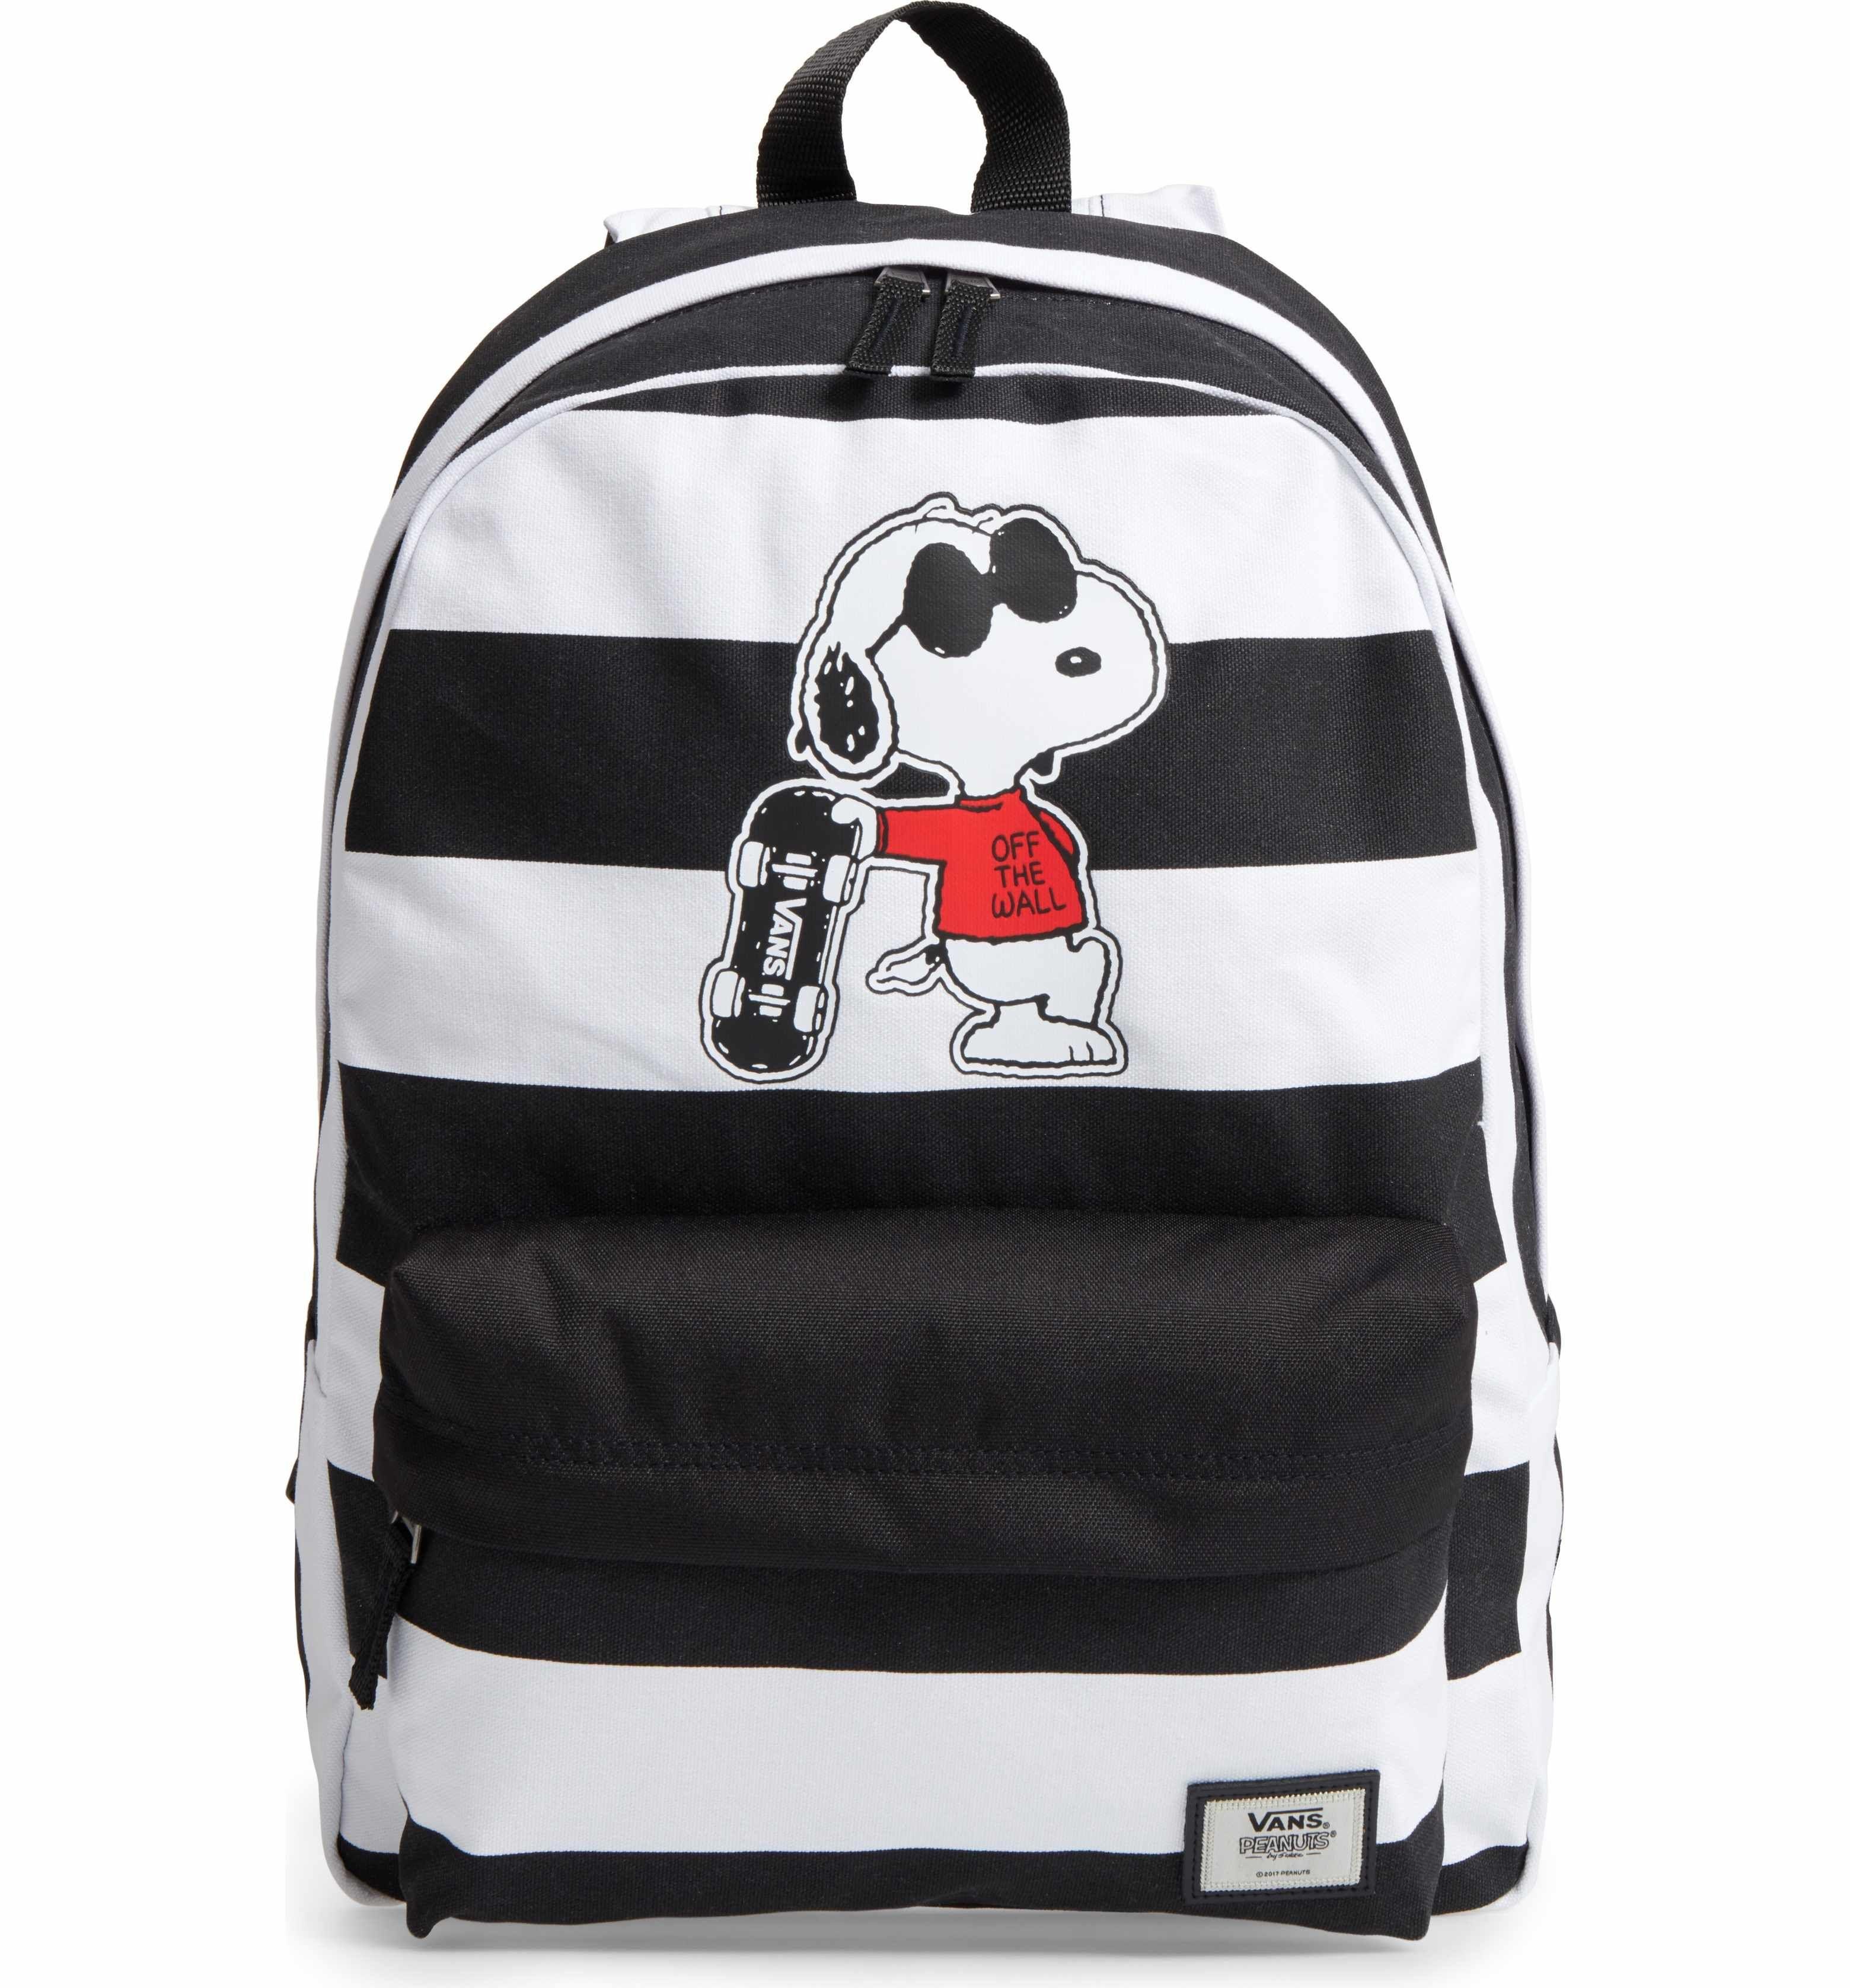 ed44aec52b2542 Main Image - Vans x Peanuts® Realm - Joe Cool Snoopy Backpack (Kids ...